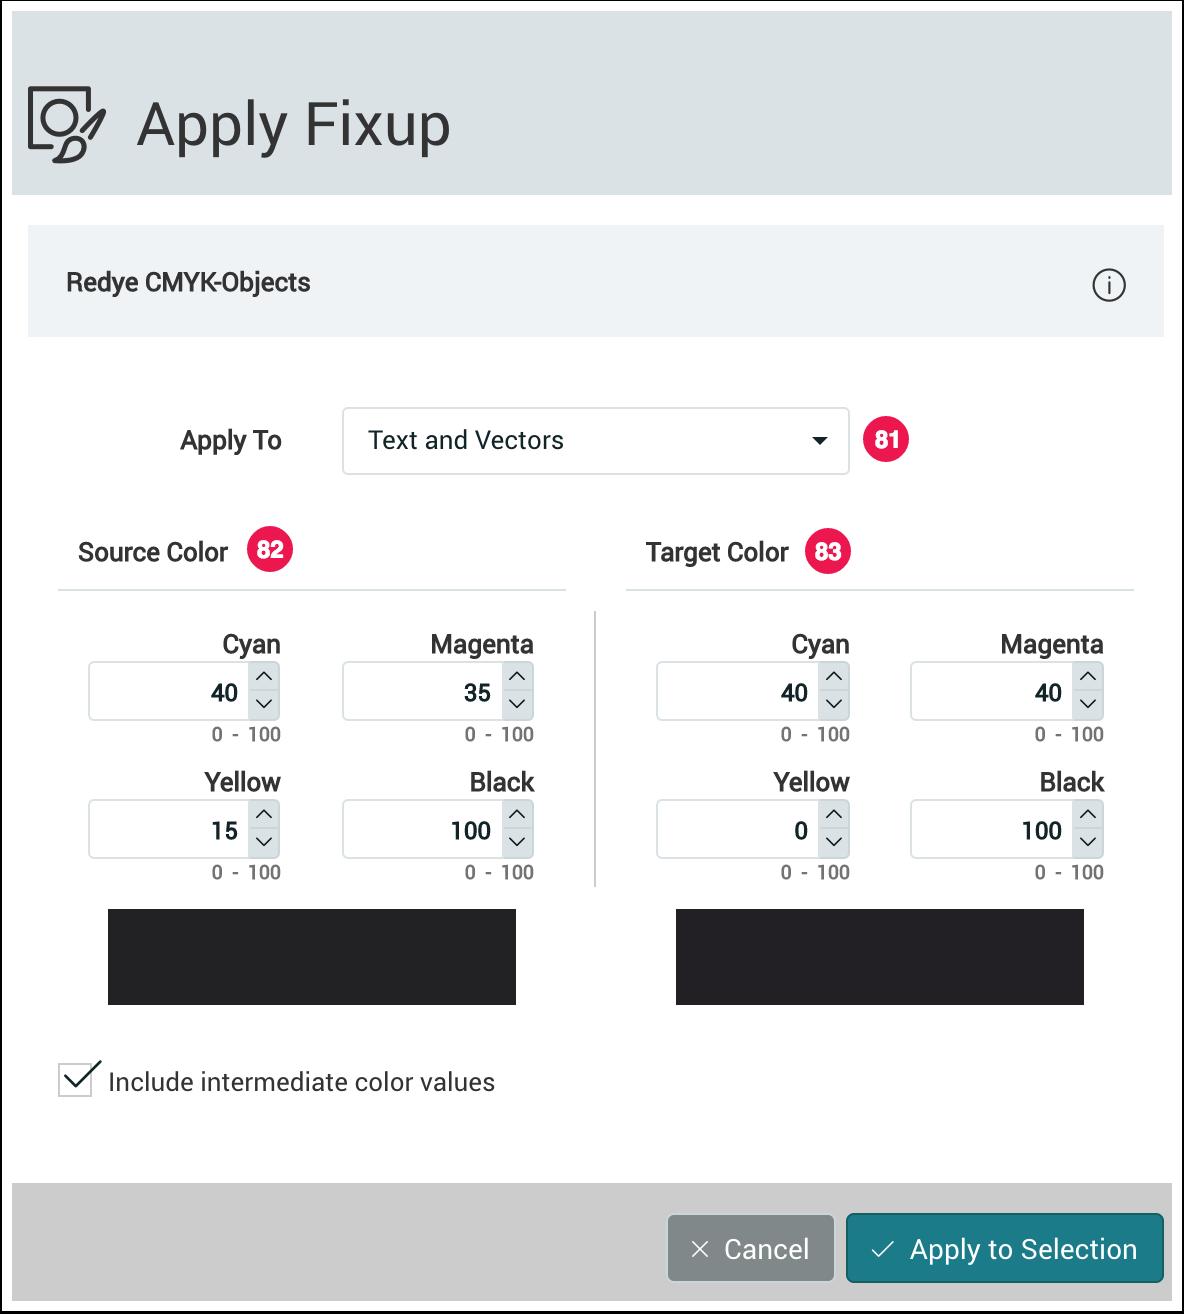 Redye CMYK-Objects Fixup - 1.7.3